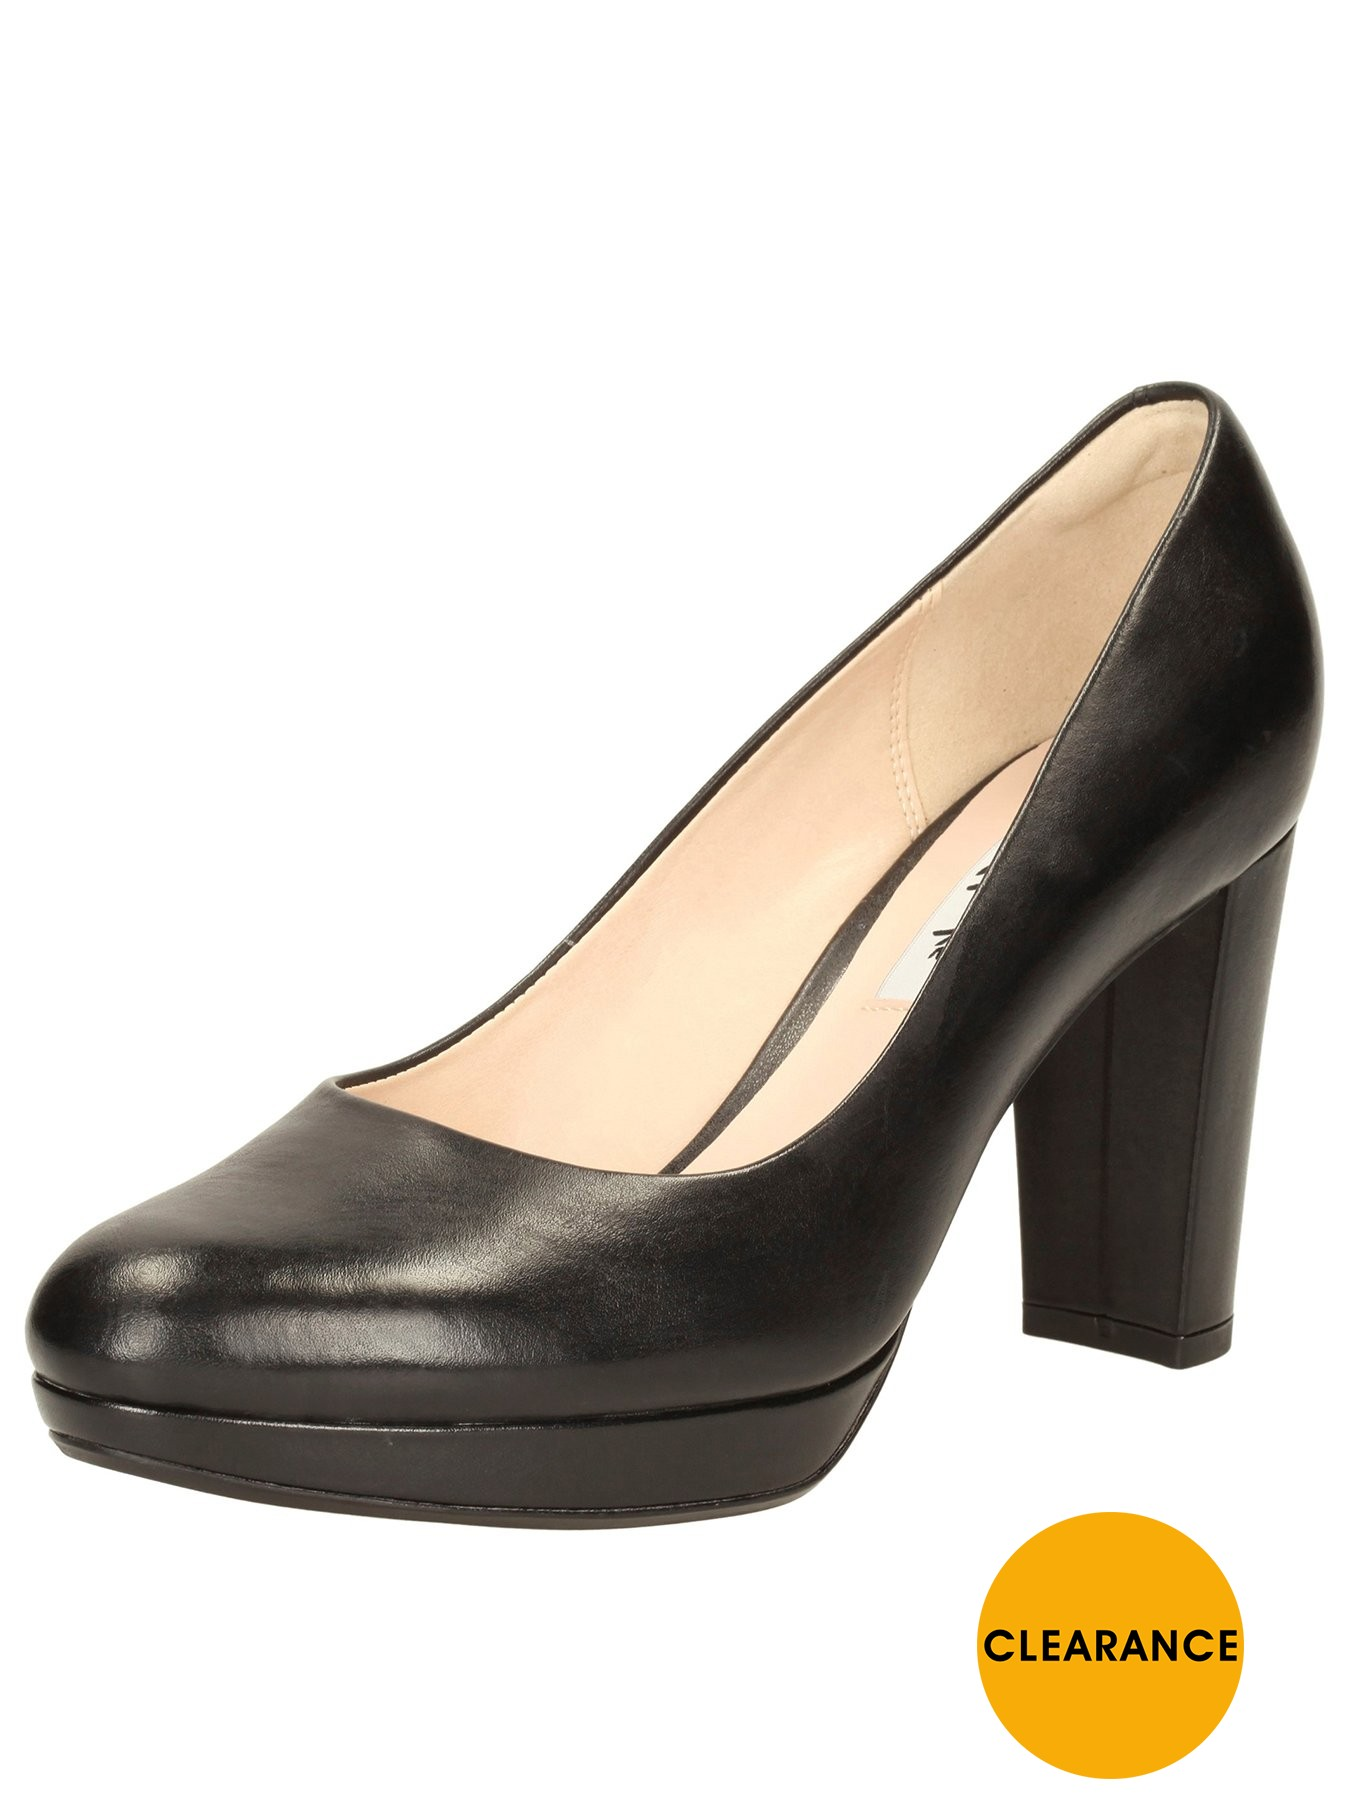 Clarks Kendra Sienna Court Shoe 1600190888 Women's Shoes Clarks Heels